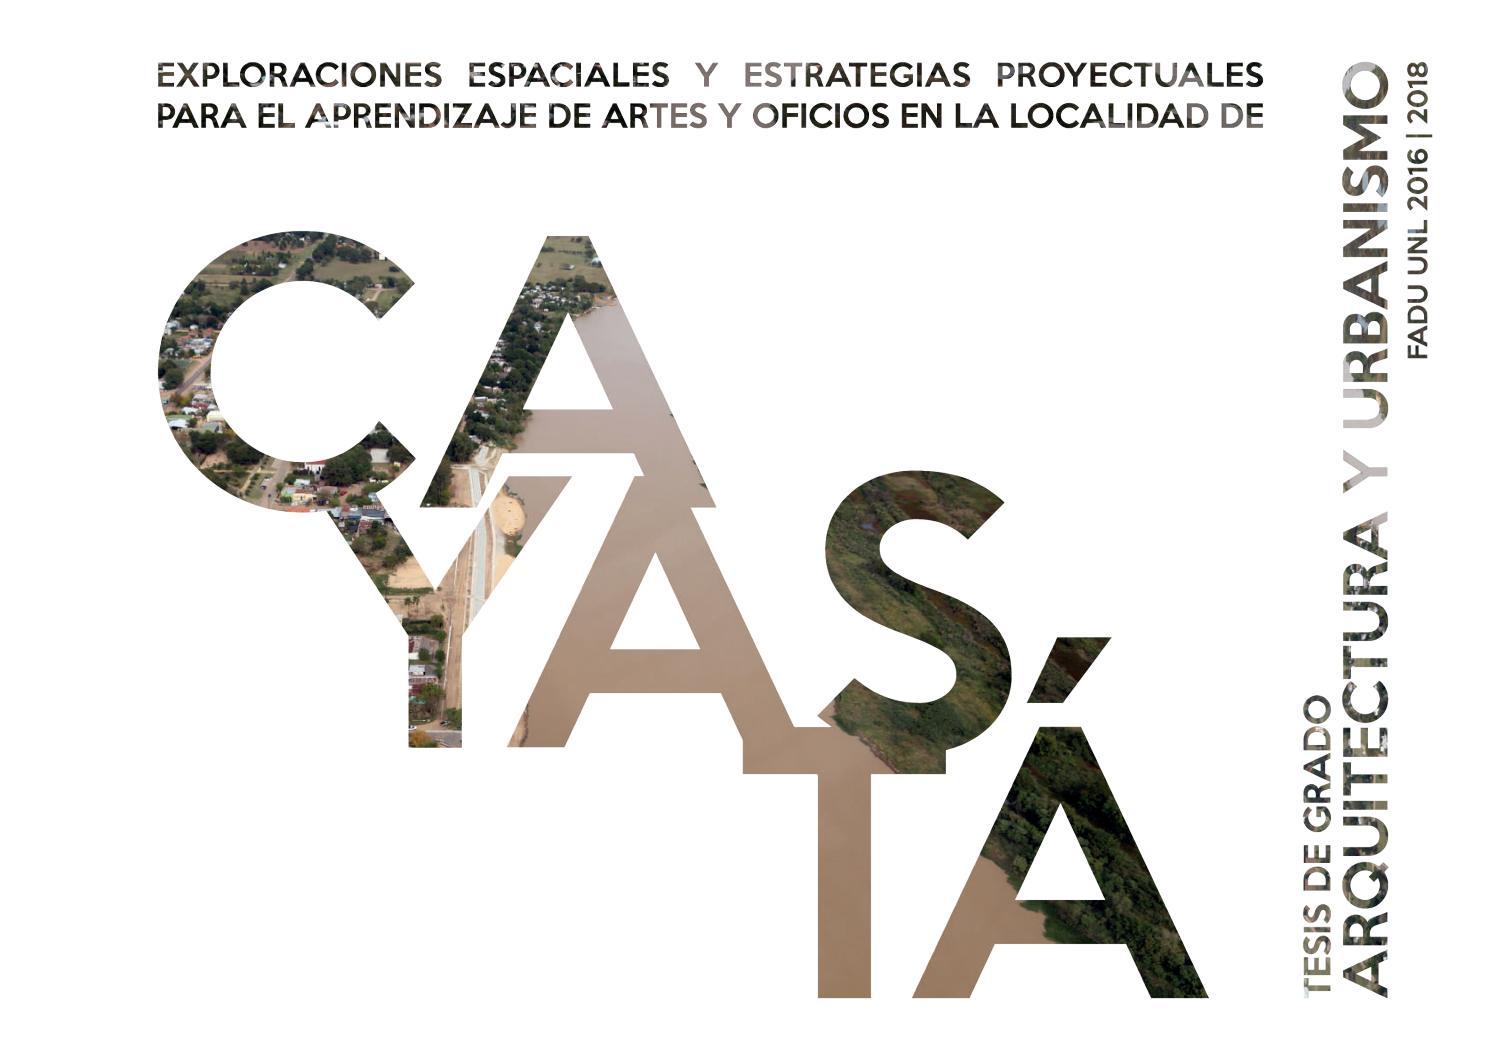 Tesis Arquitectura Y Urbanismo 2018 Fadu Unl By Anamagdalen